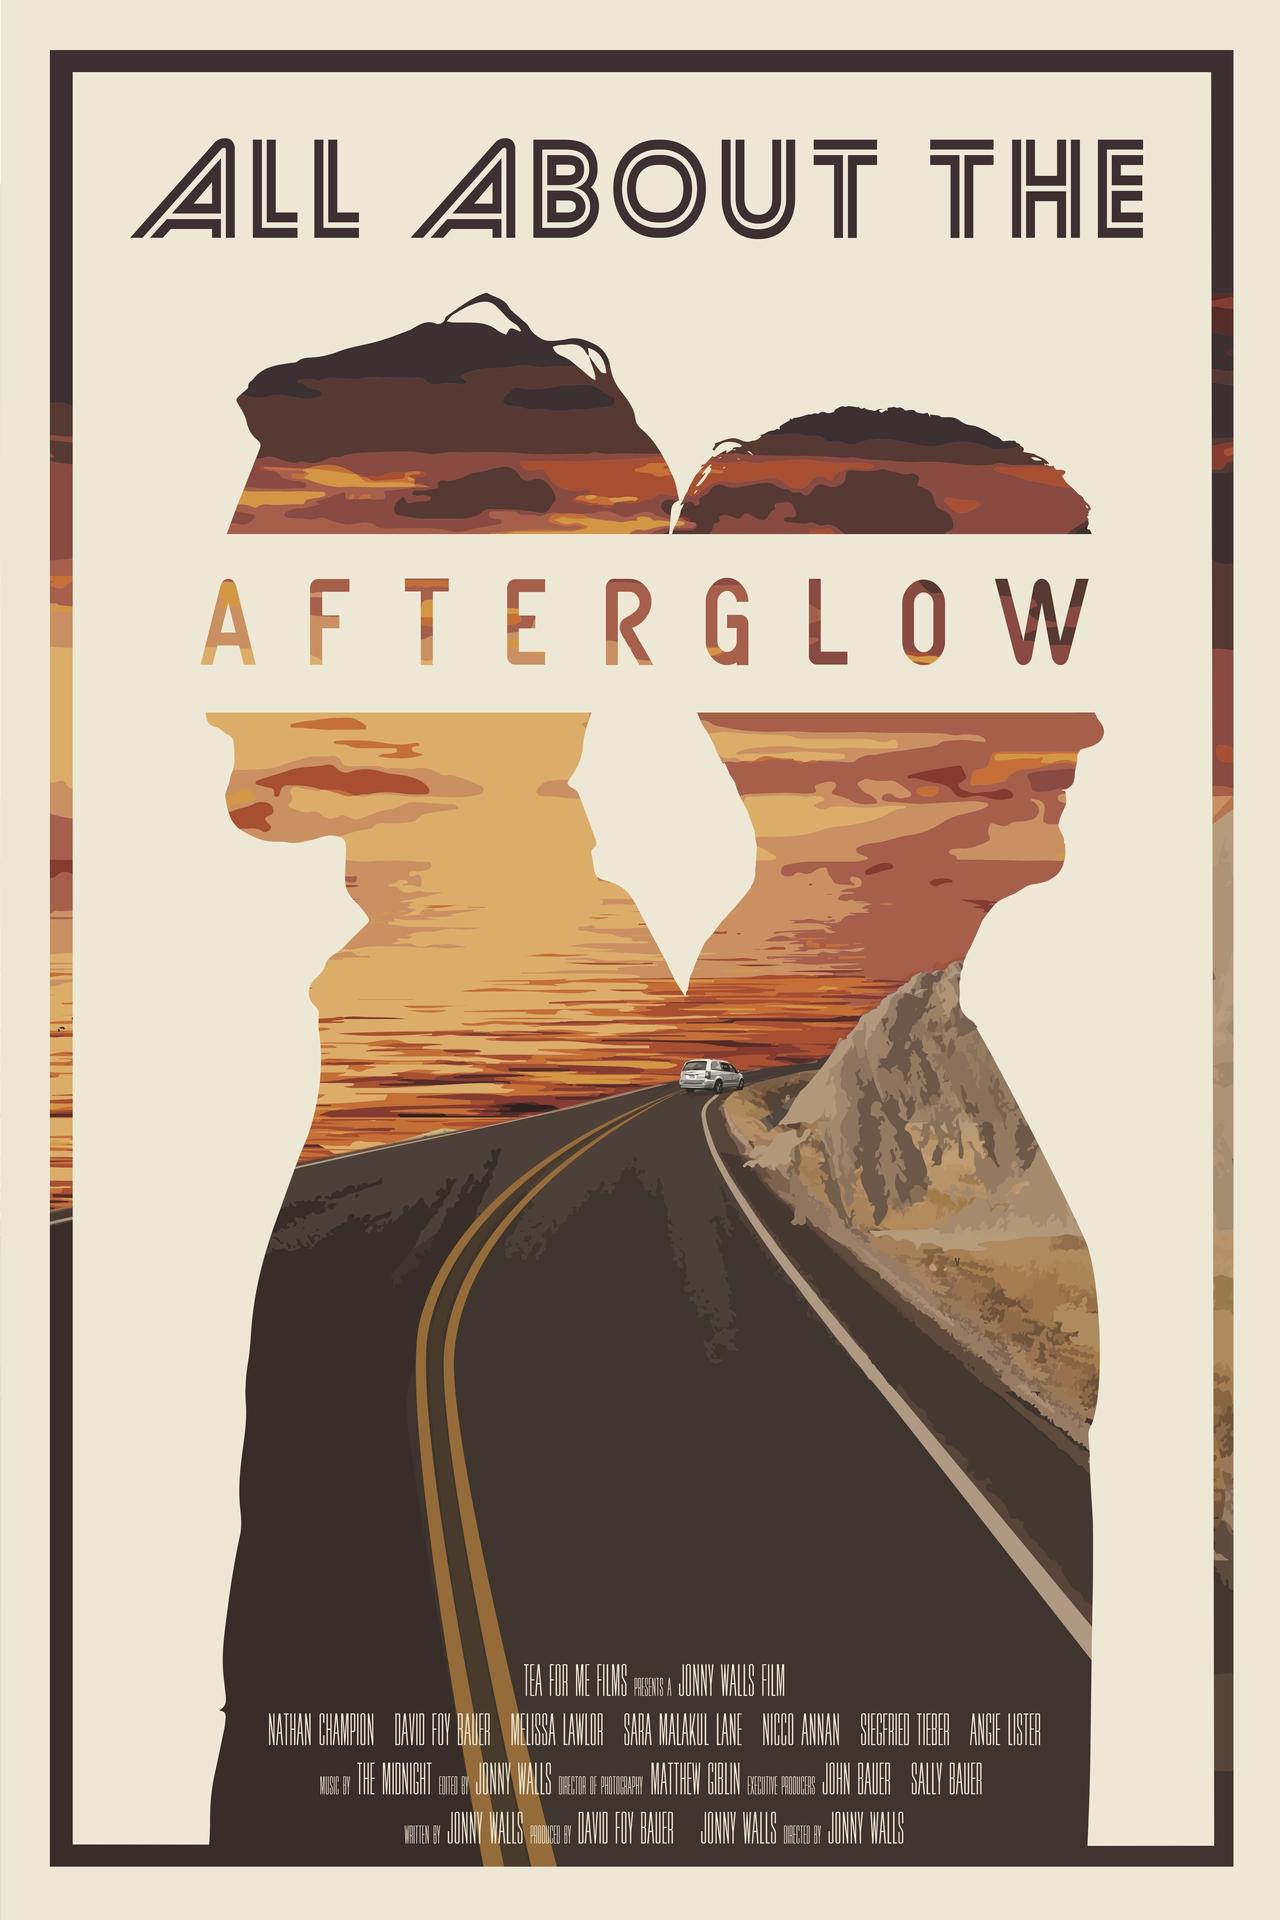 فیلم سینمایی All About the Afterglow به کارگردانی Jonny Walls